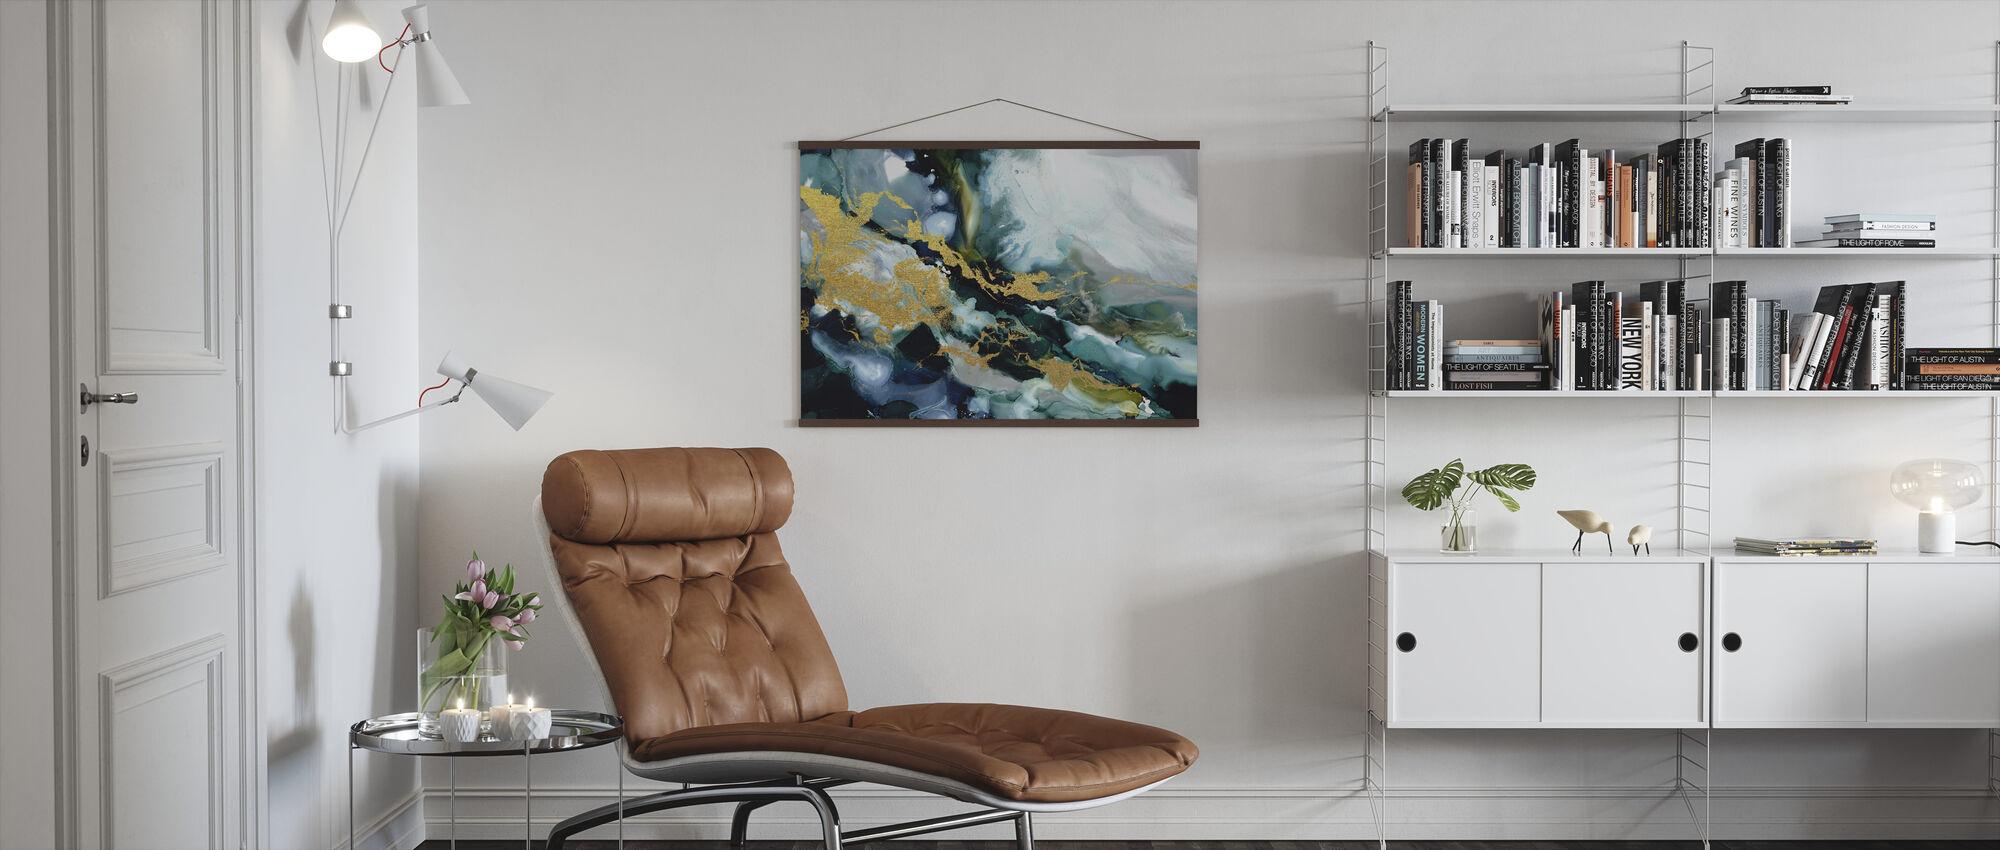 Golden Riptide - Poster - Living Room